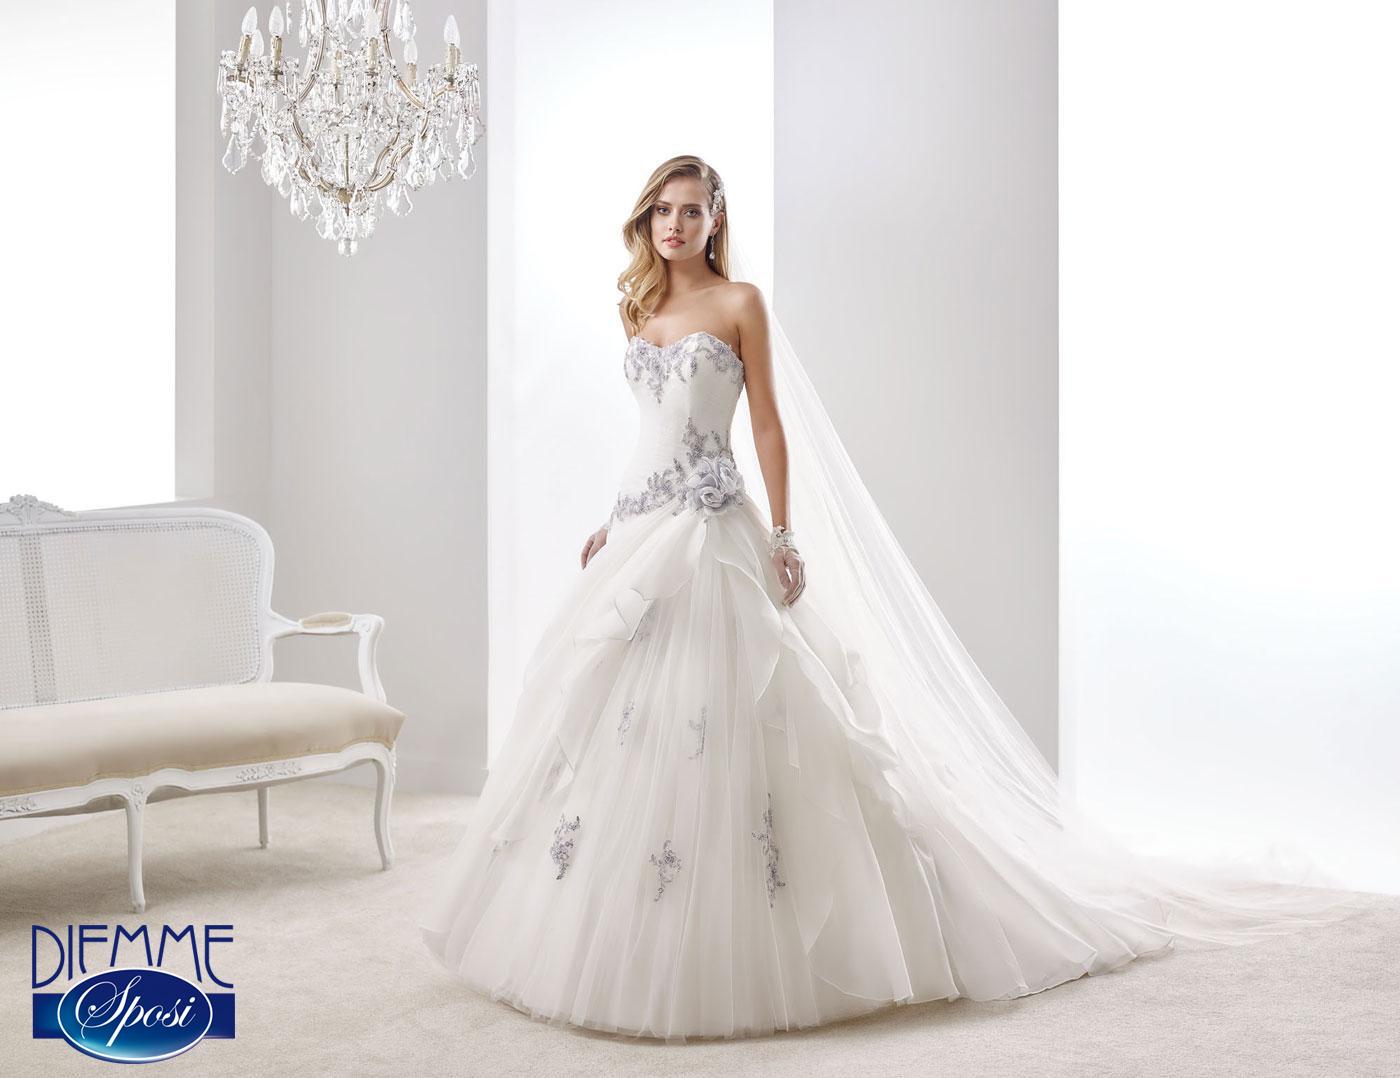 nicole-spose-JOAB16498-Jolies-moda-sposa-2016-813 - Diemme Sposi